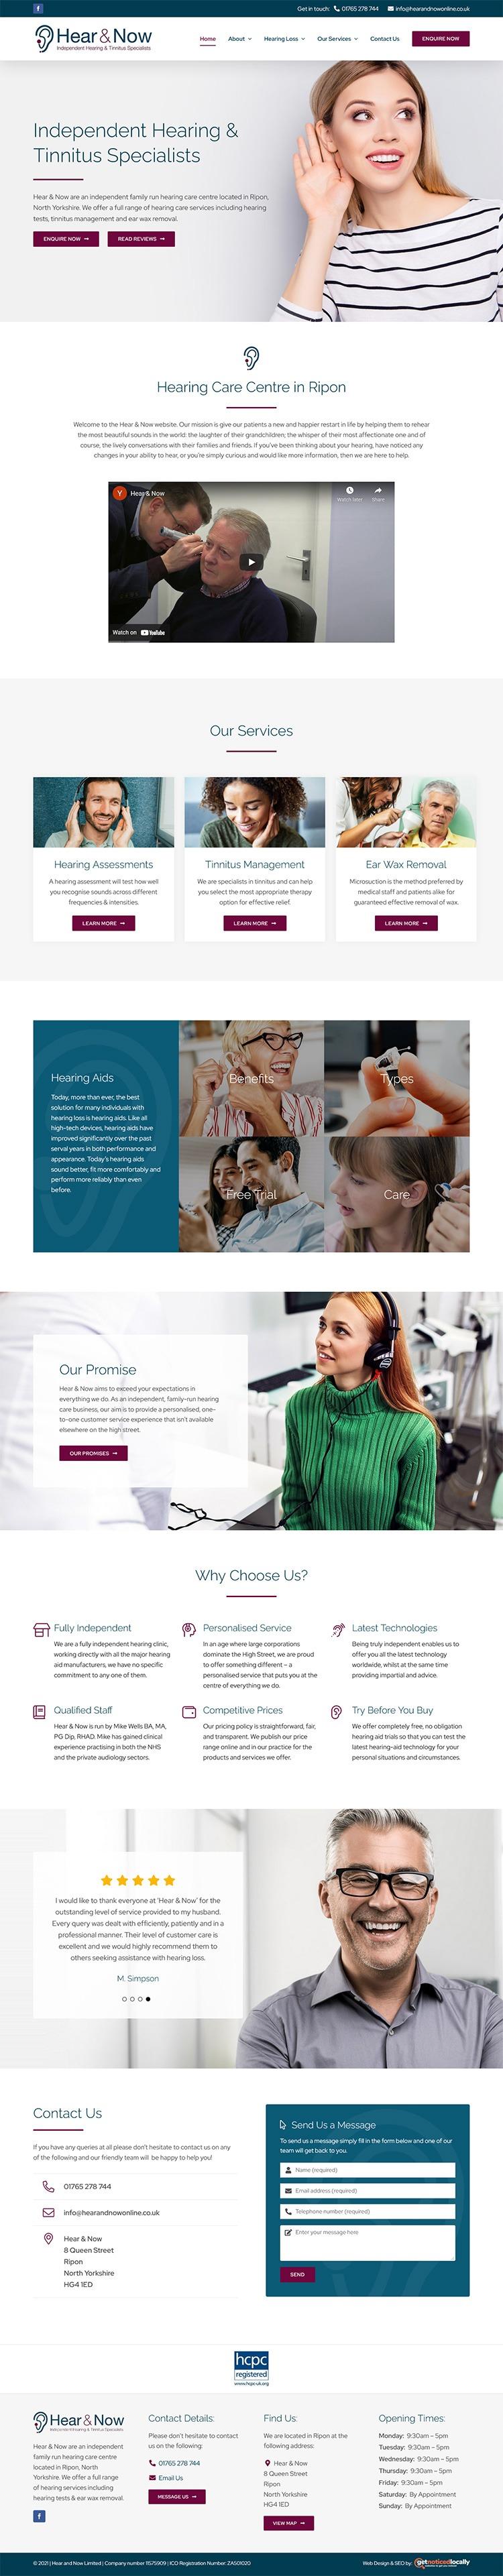 Website Design for Hear & Now